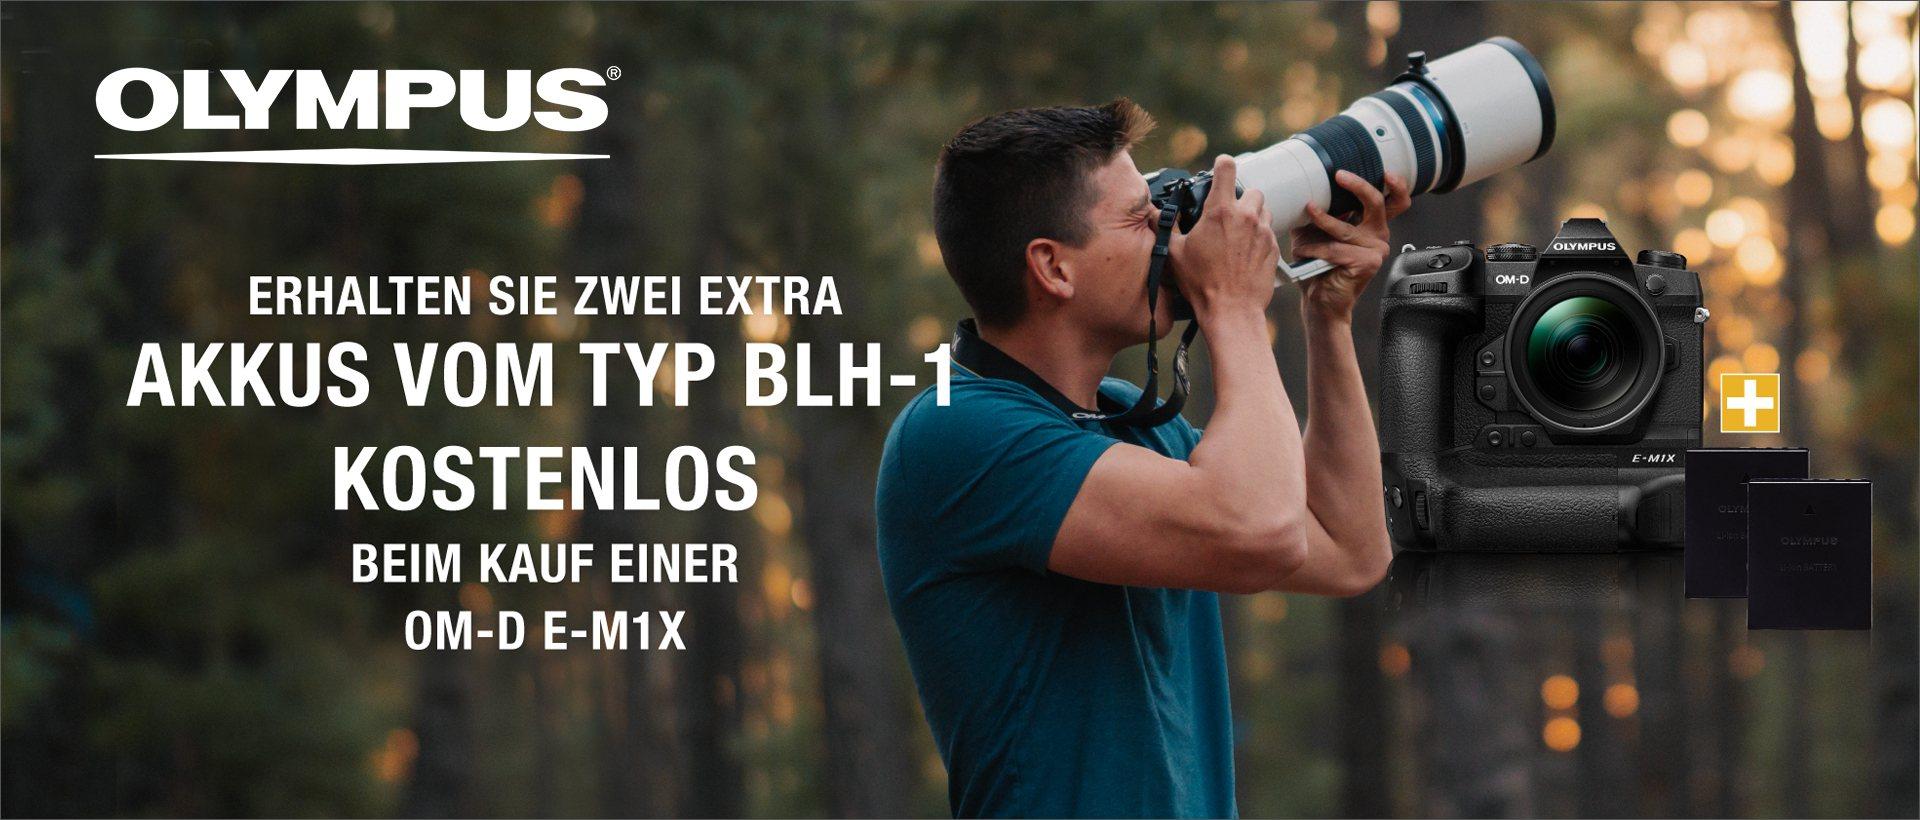 Olympus OM-D E-M1X Aktion